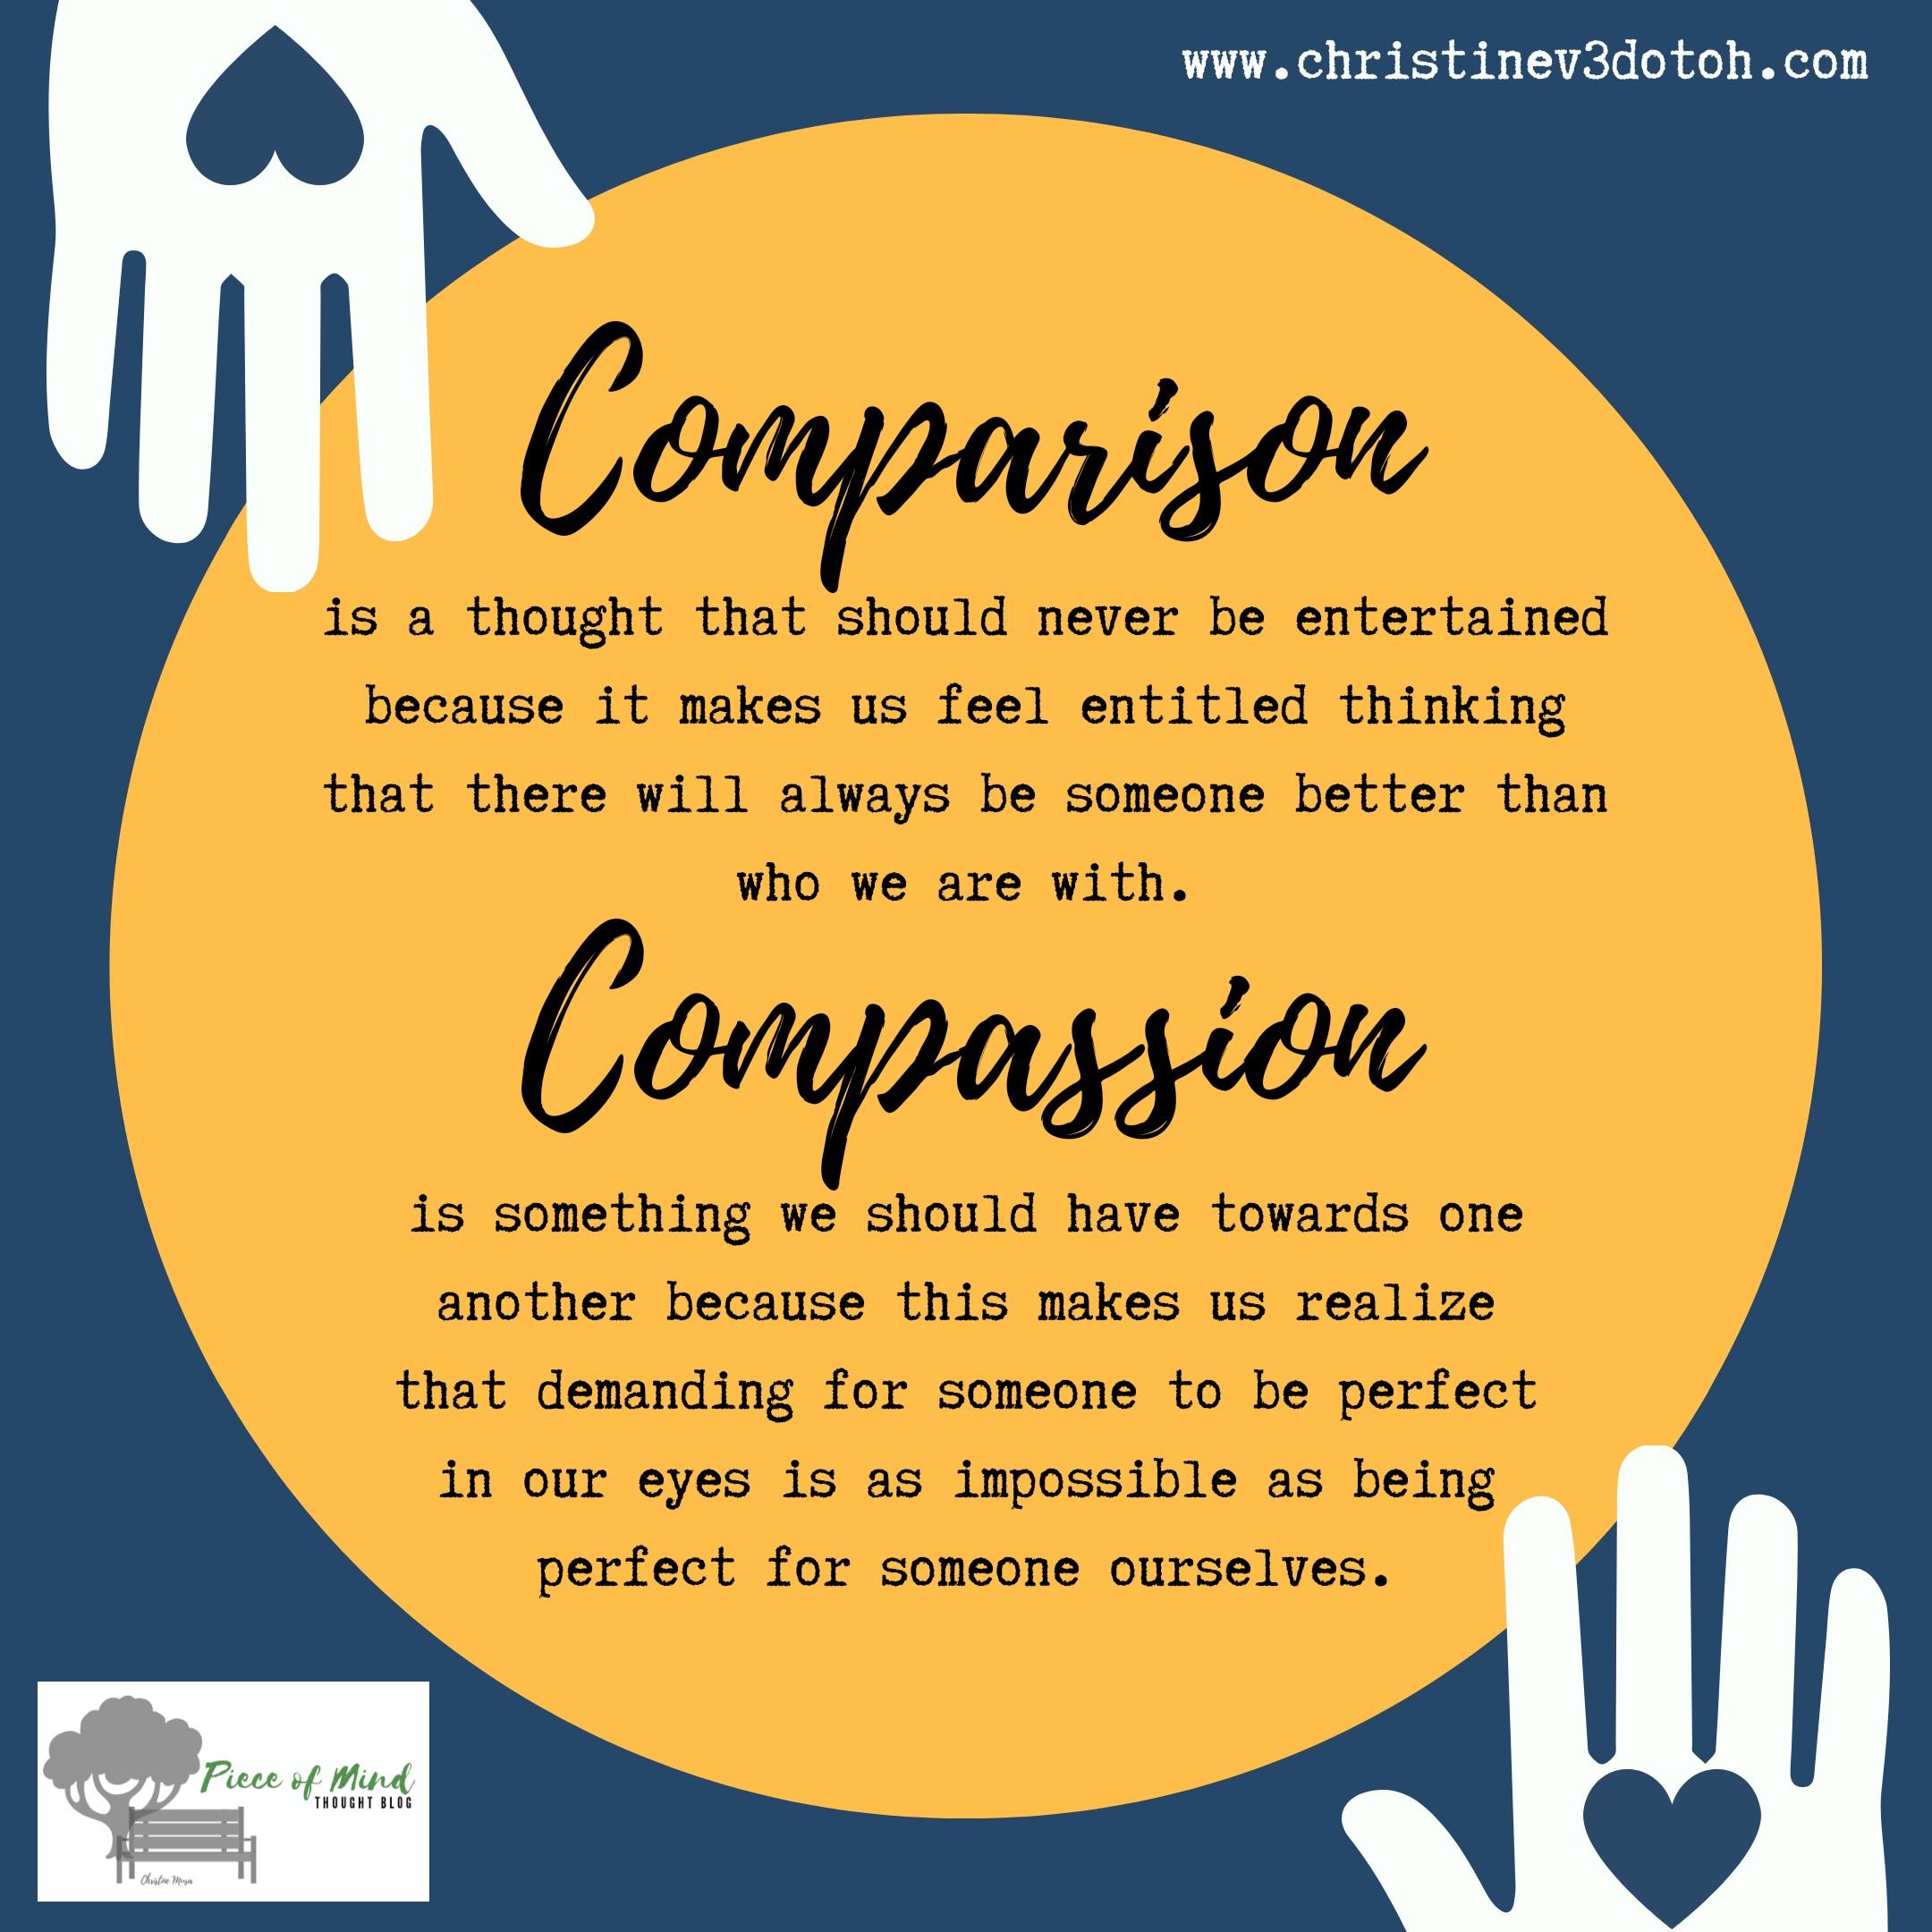 91.-Compassion-Not-Comparison